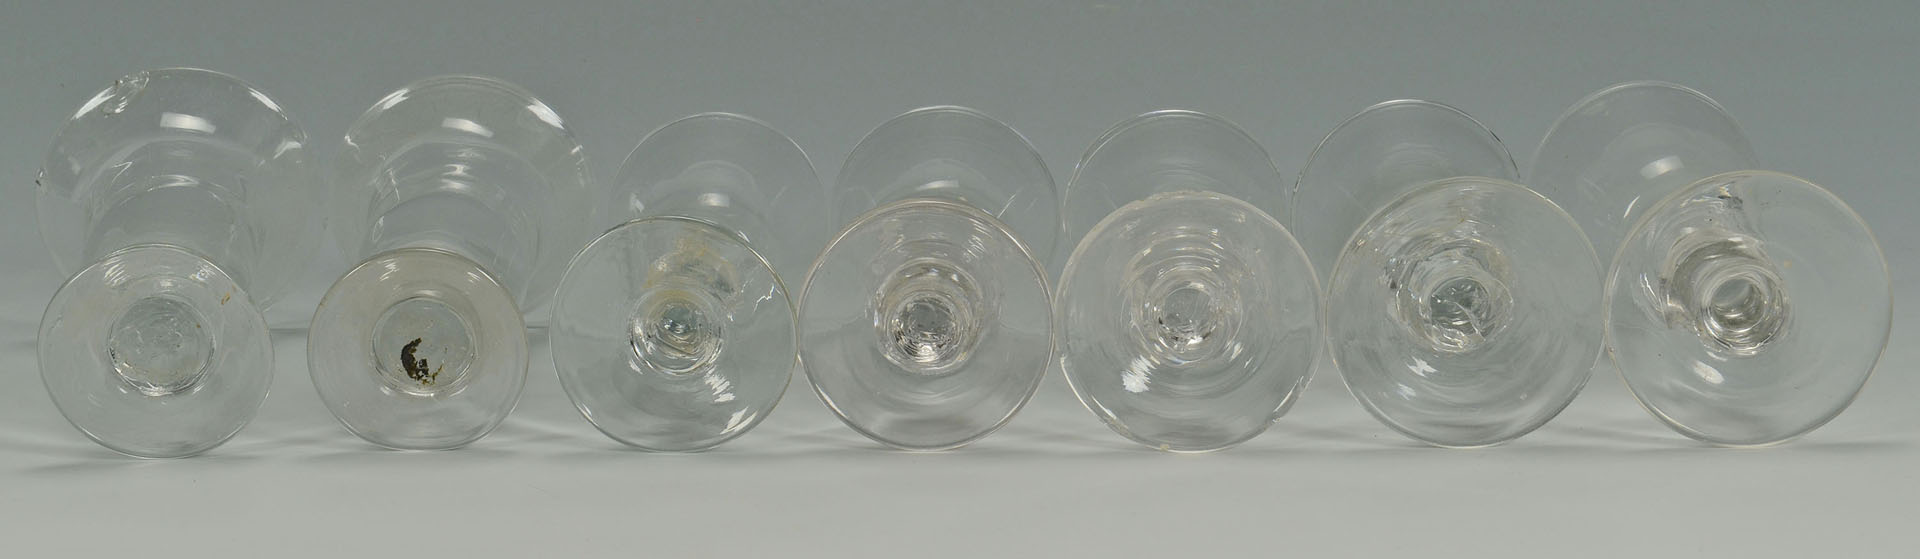 Lot 531: Early Blown Glass Drinking Vessels, 11 items